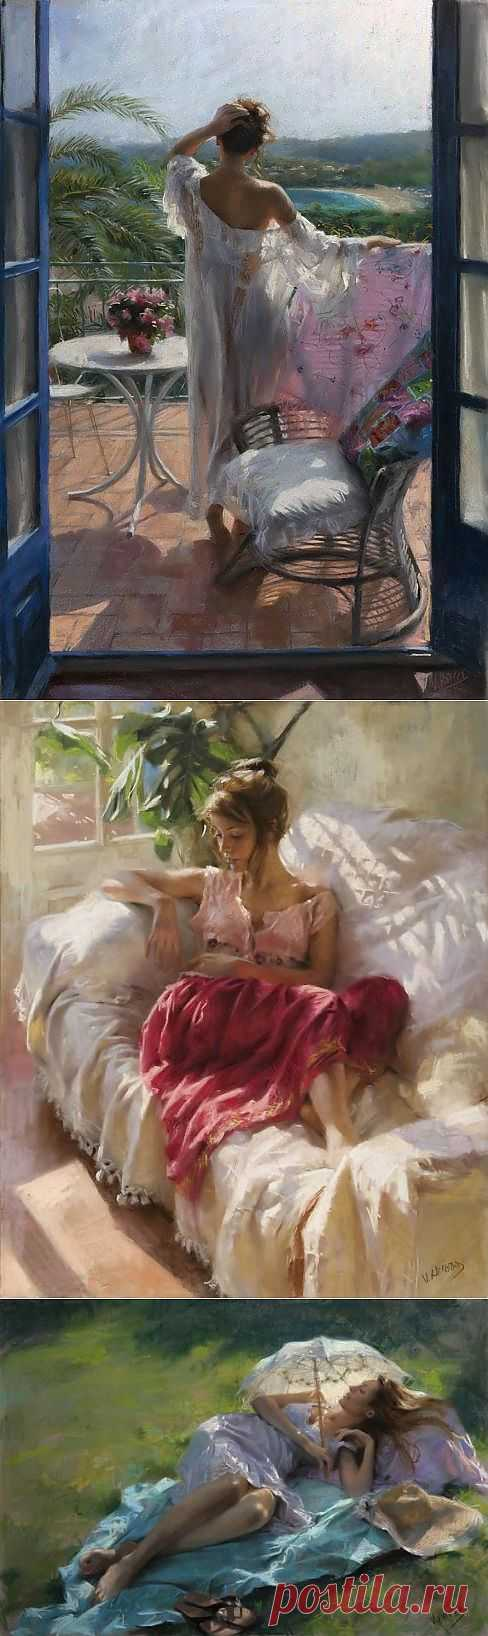 Коллекция работ испанского художника Vicente Romero Redondo.